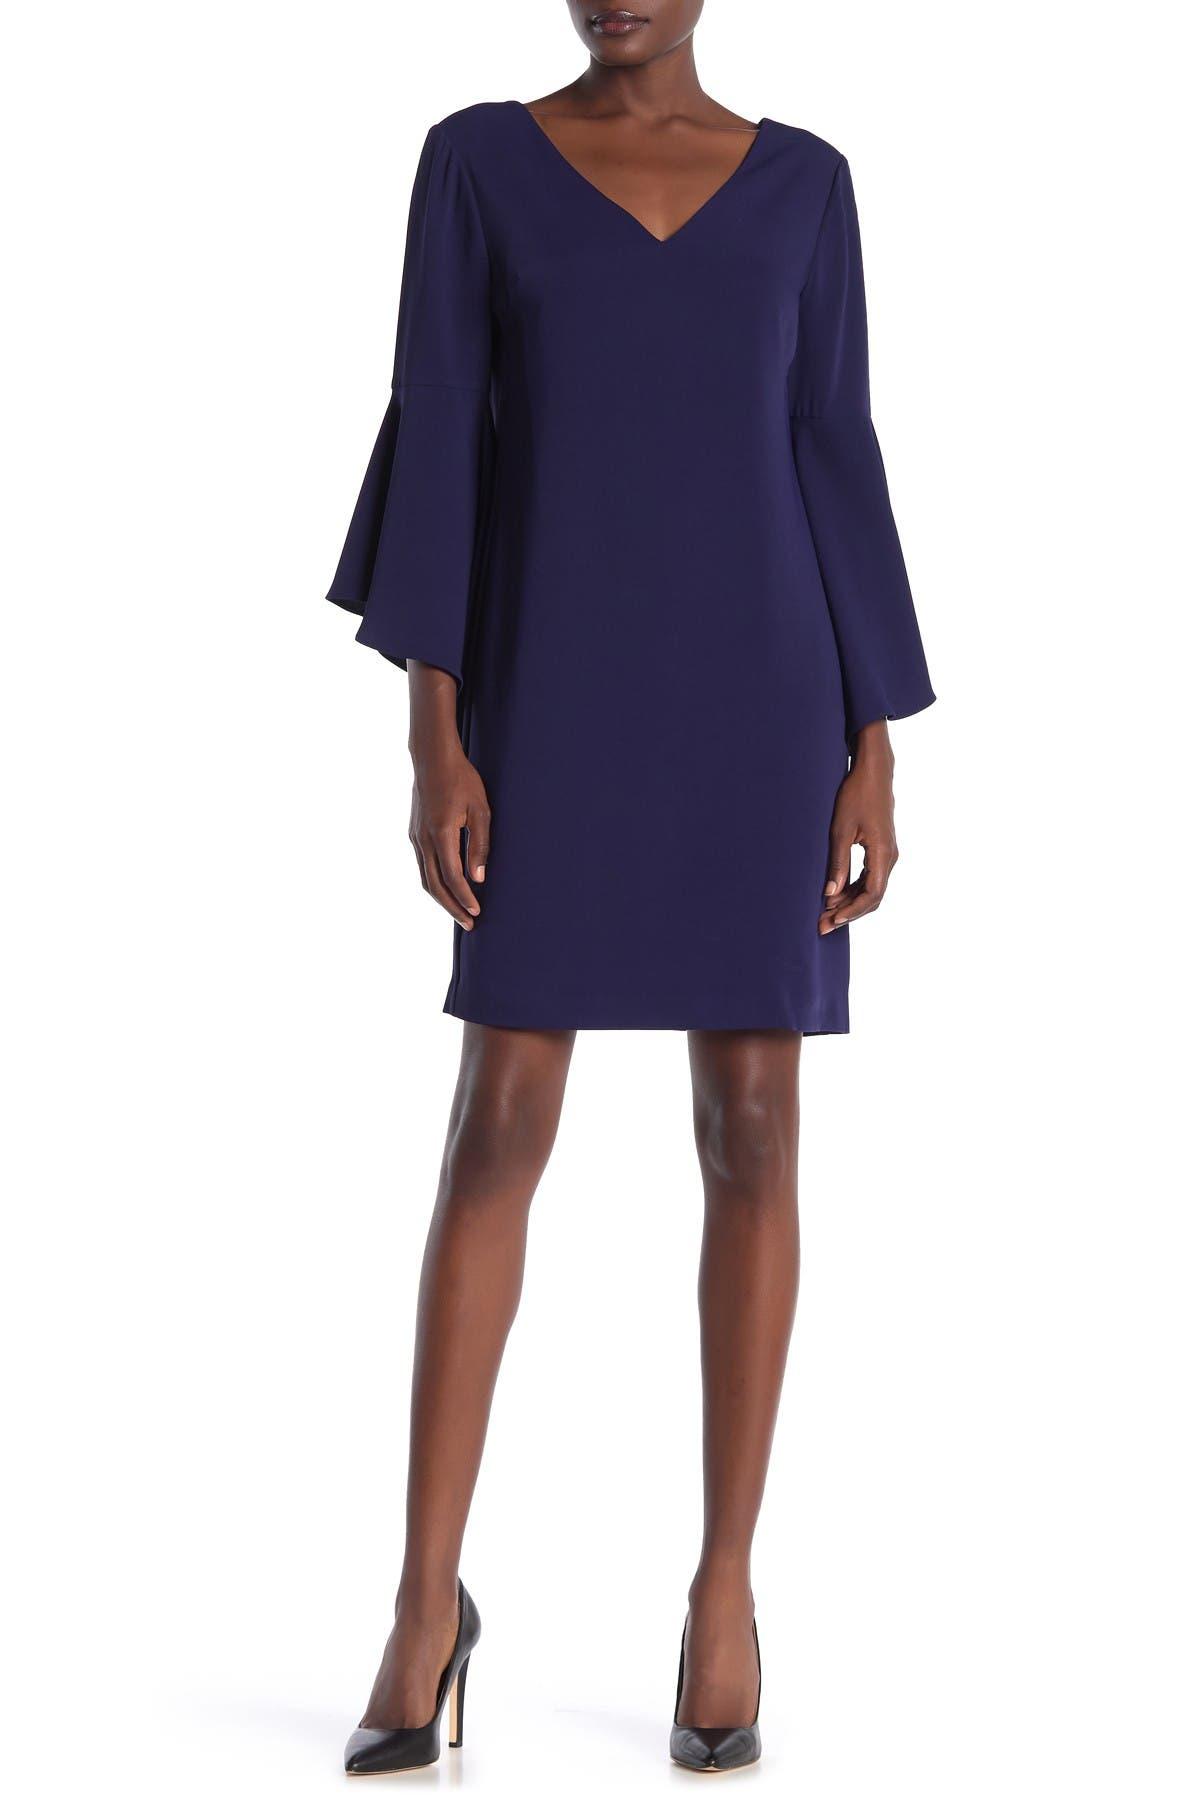 Image of trina Trina Turk Nico Bell Sleeve Dress